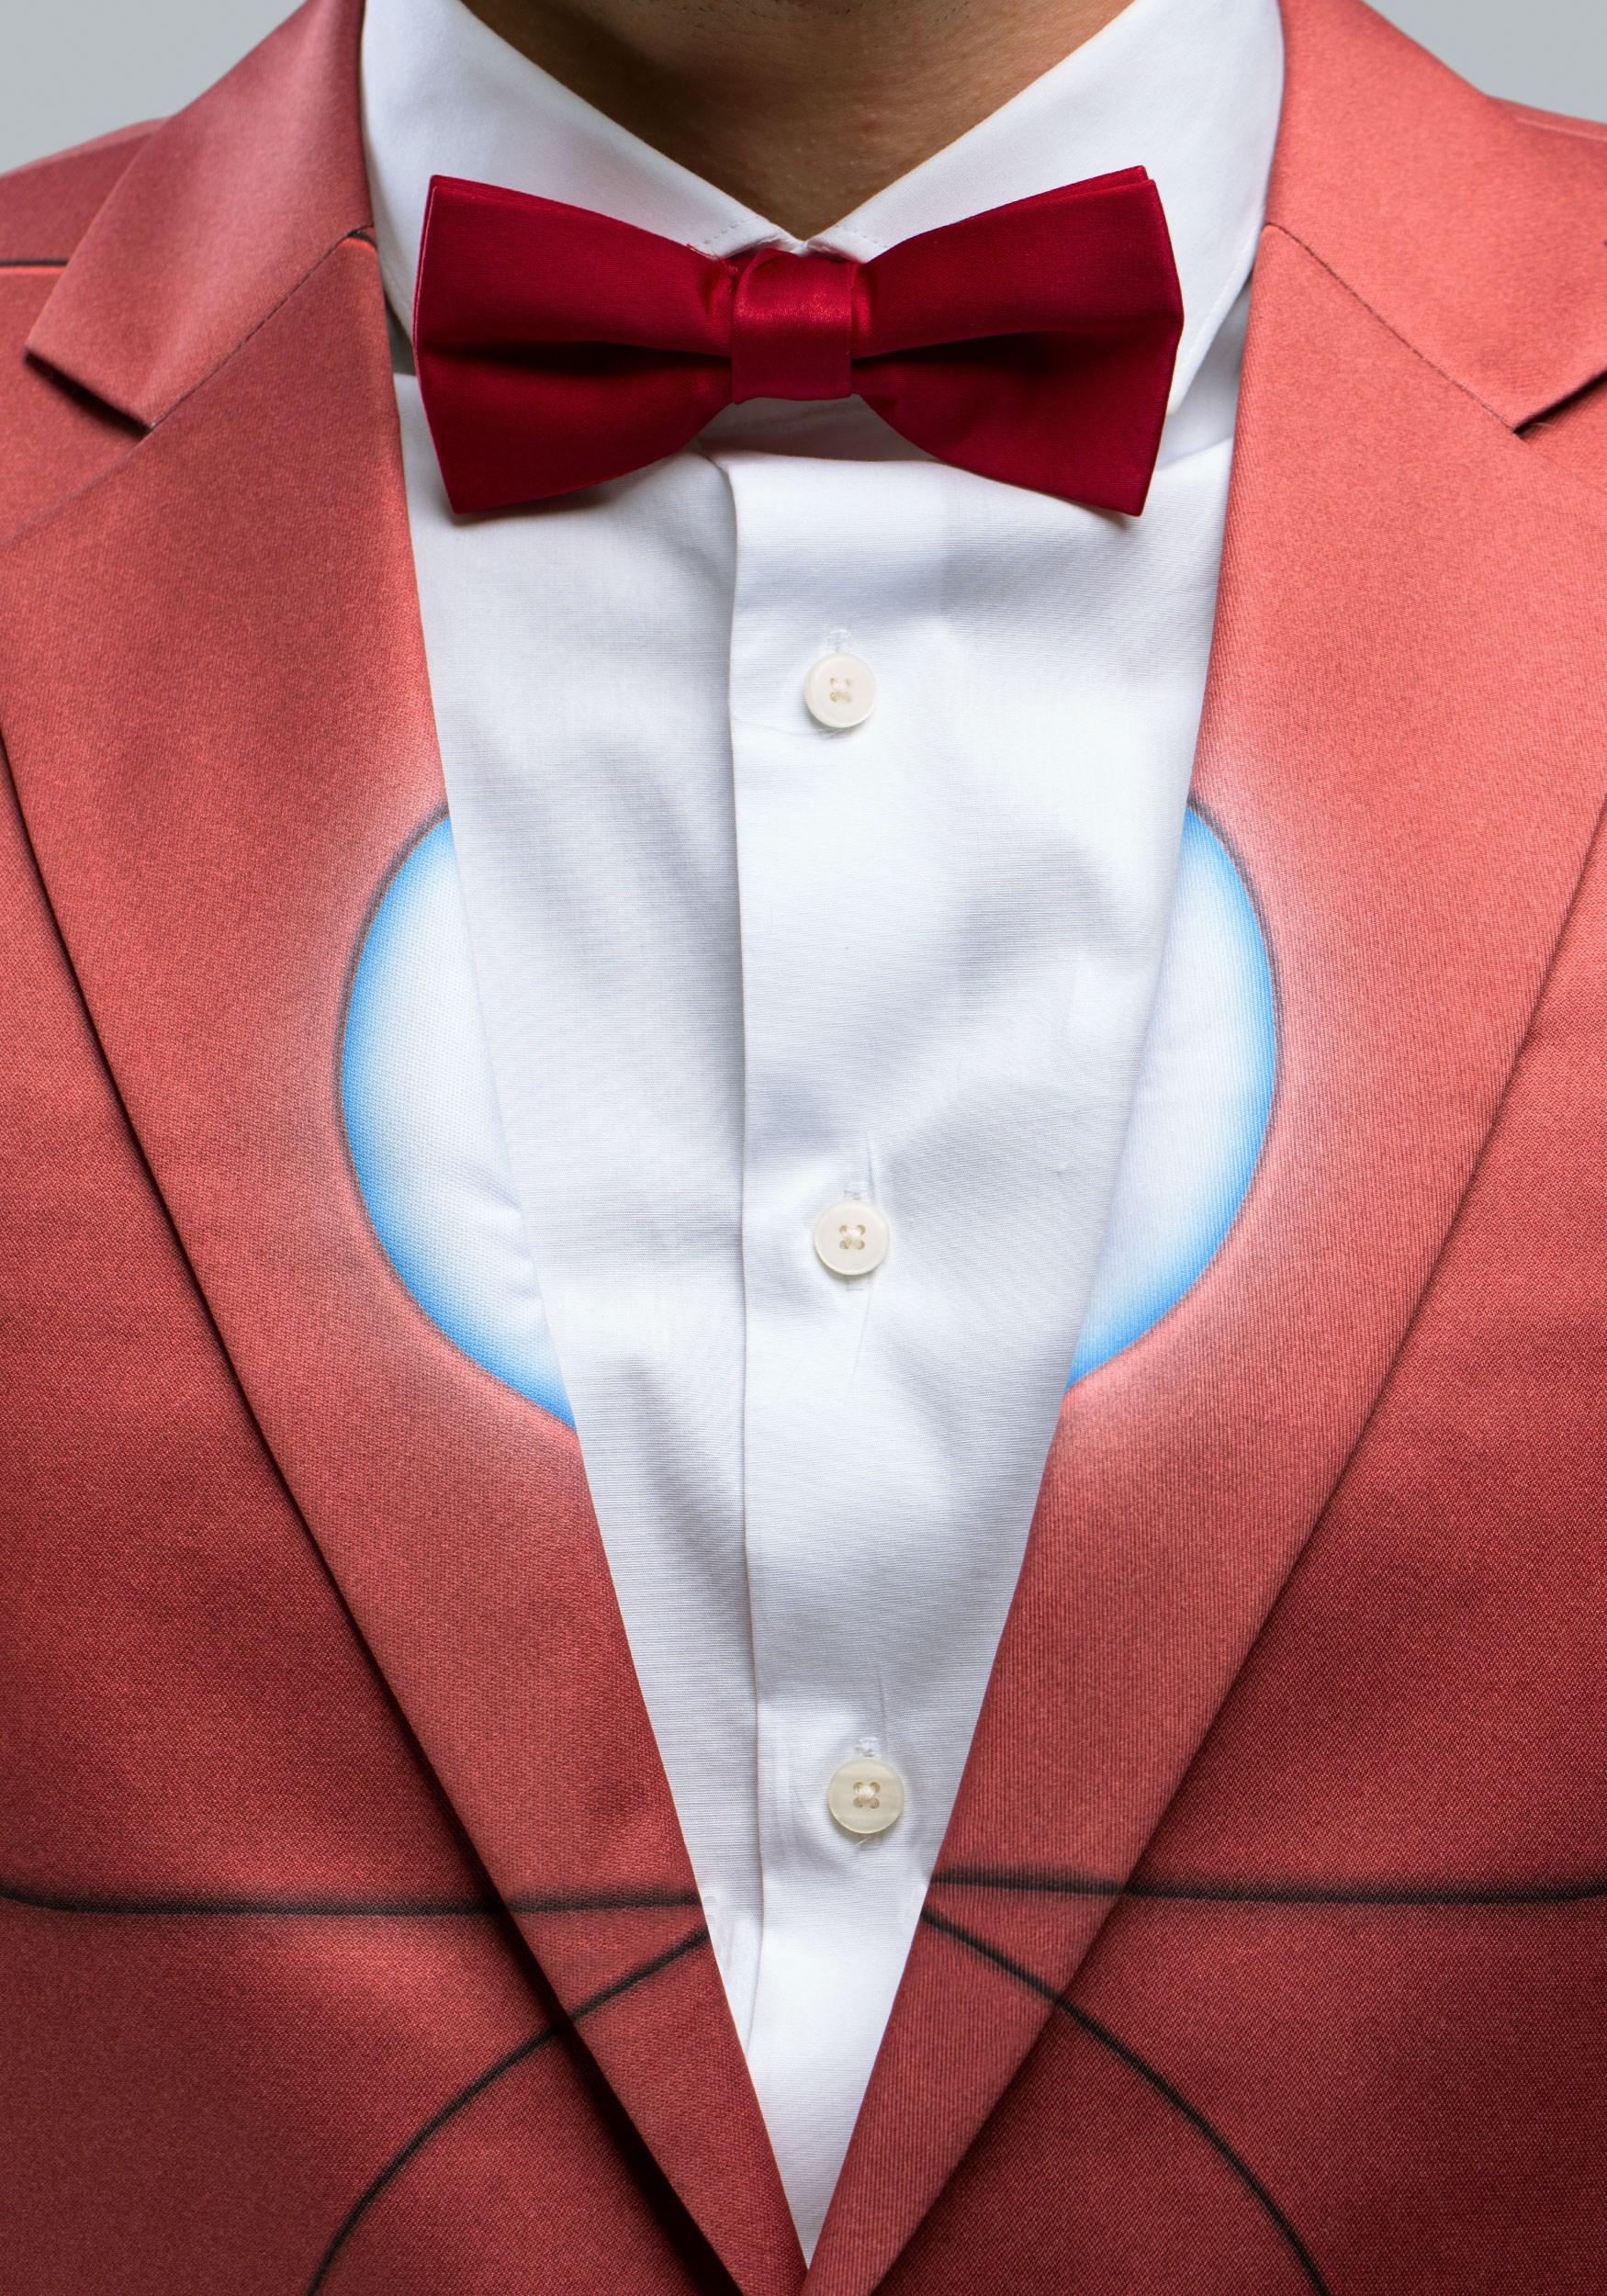 Iron Man Suit Jacket (Alter Ego) & Alter Ego Iron Man Slim Fit Suit Jacket for Men